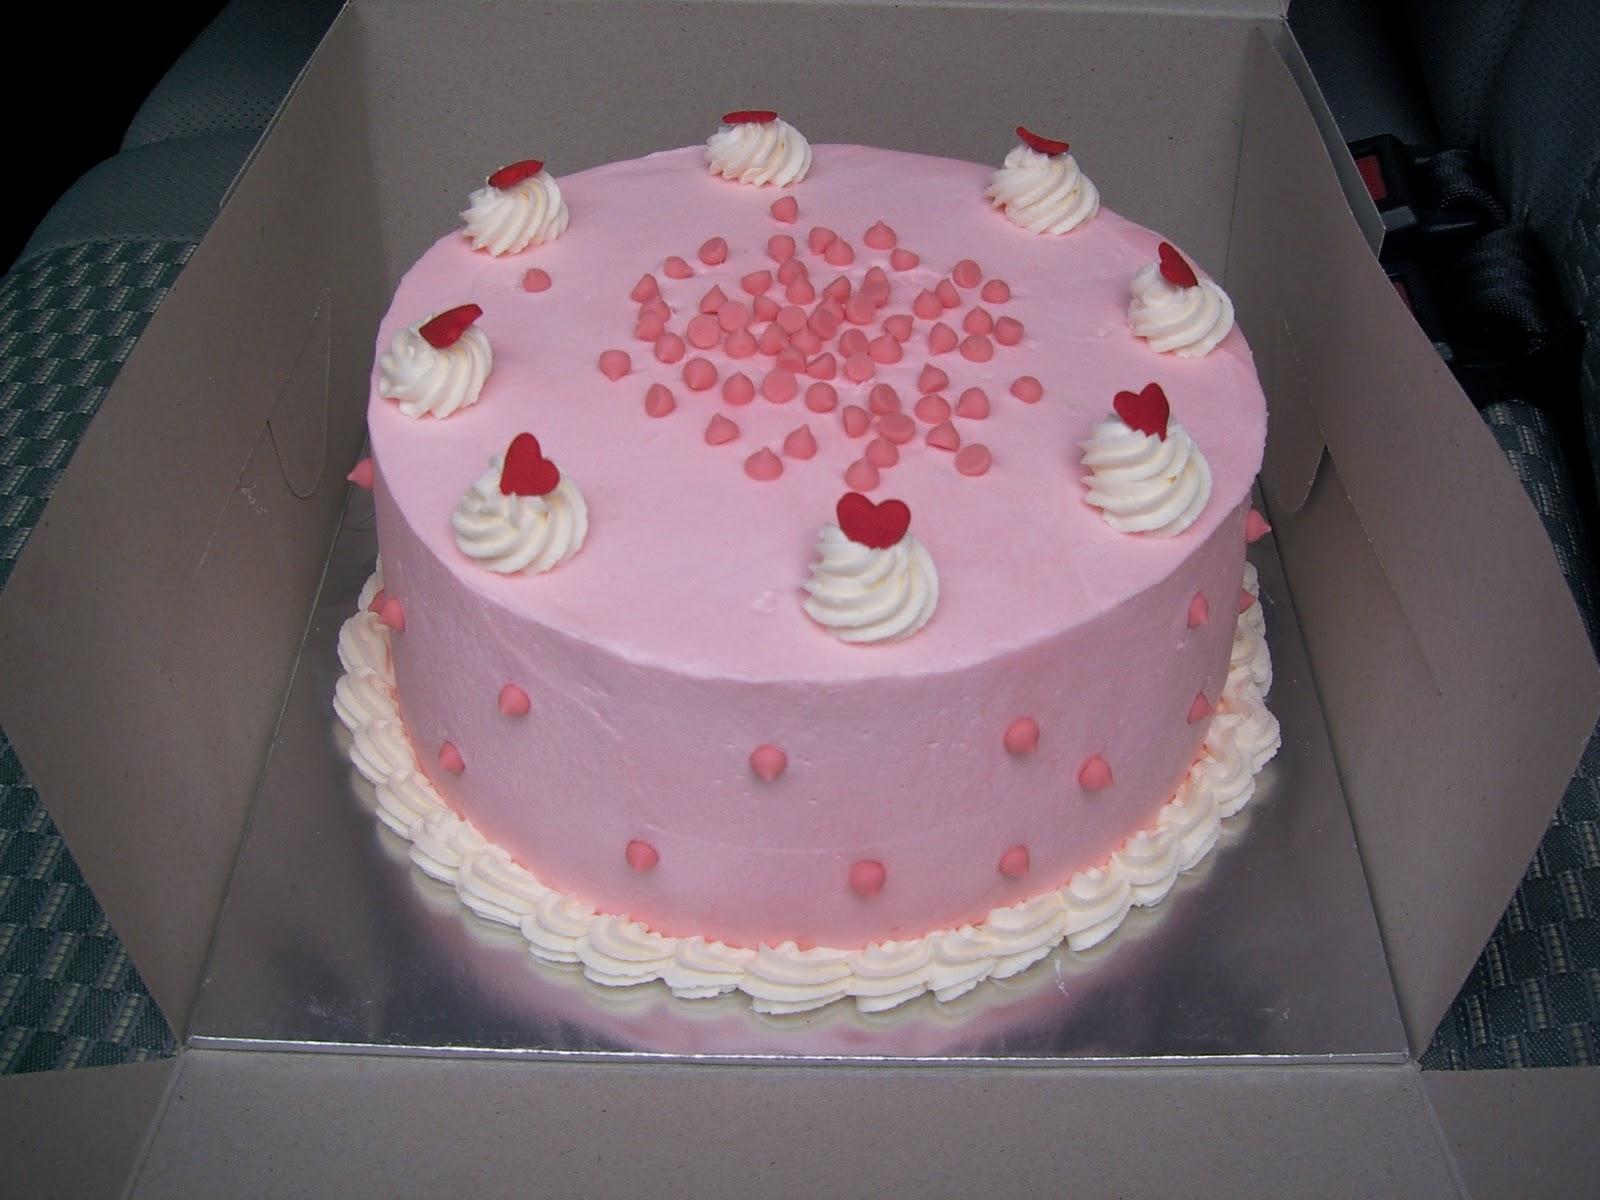 Cantik Cupcake: Strawberry Cake with Strawberry Buttercream